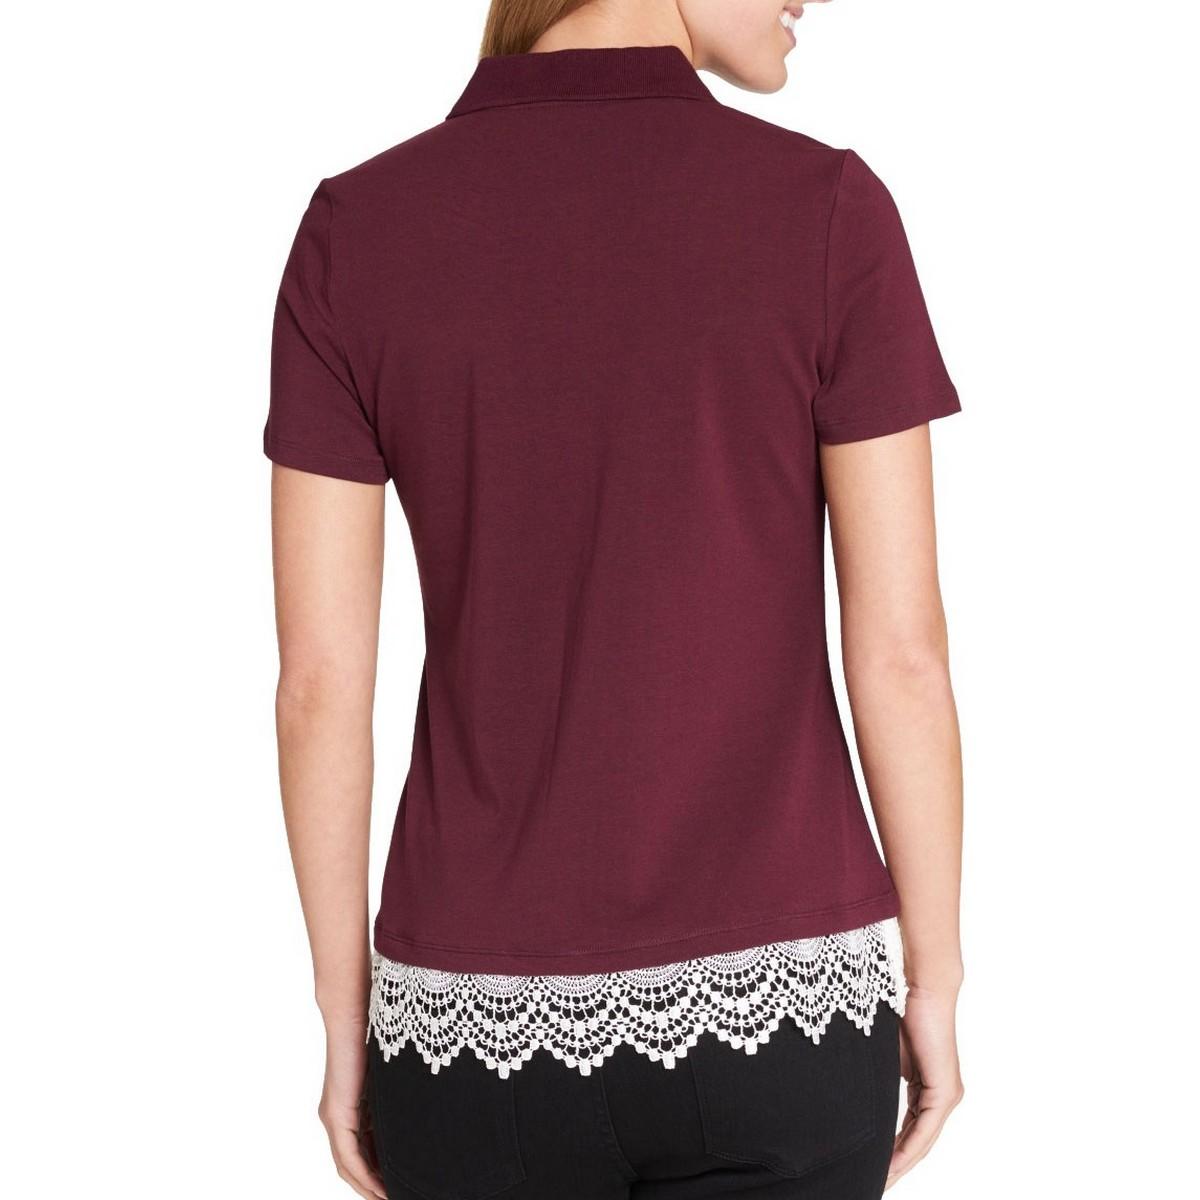 TOMMY-HILFIGER-NEW-Women-039-s-Lace-Trim-Polo-Shirt-Top-TEDO thumbnail 4